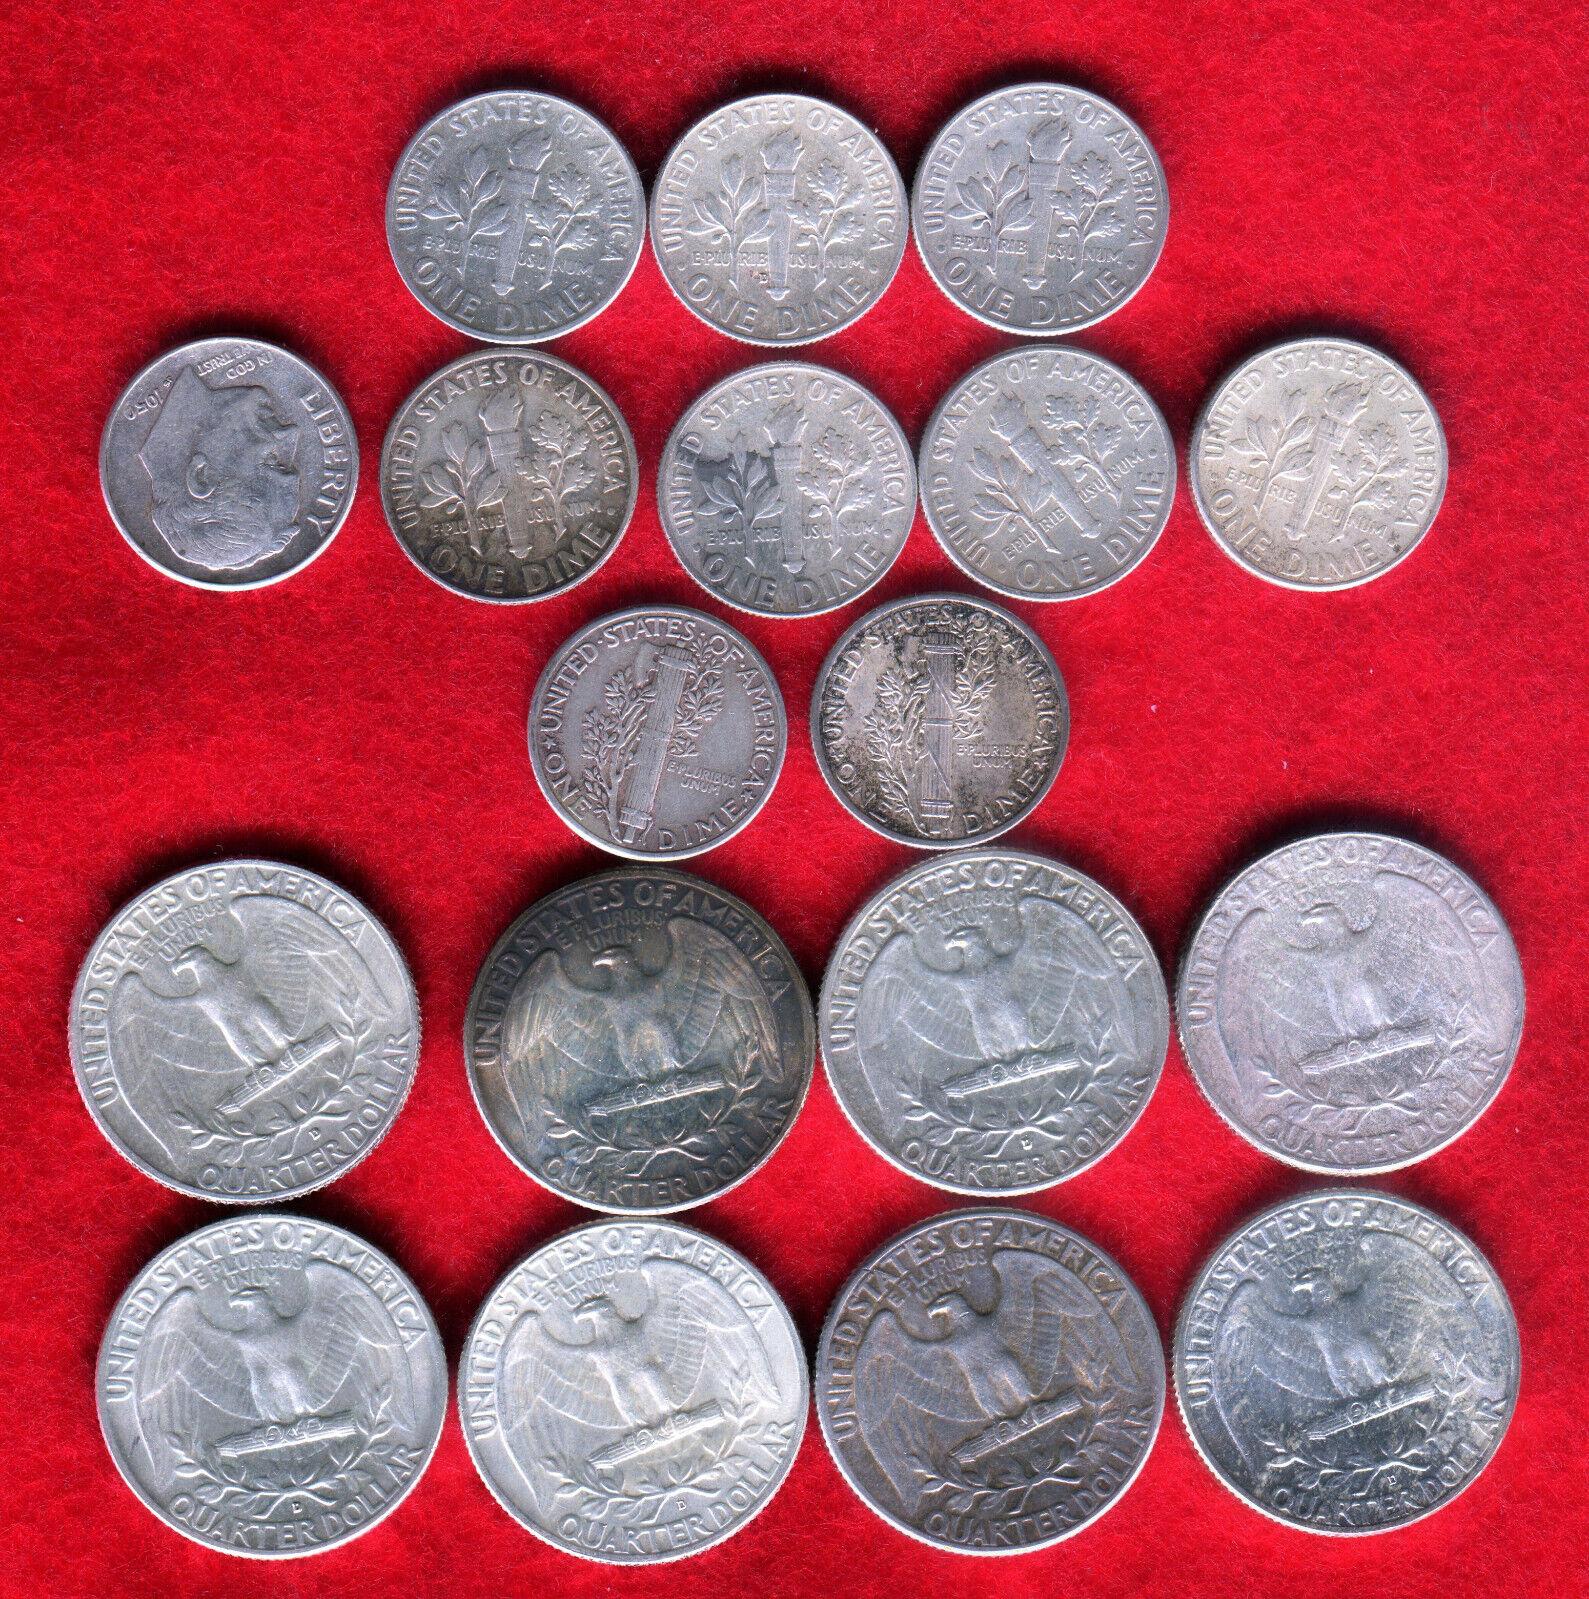 3 FACE 90 SILVER COINS WITH 2 MERCURY DIMES, 8 WASHINGTON QUARTERS, 8 DIMES - $59.99